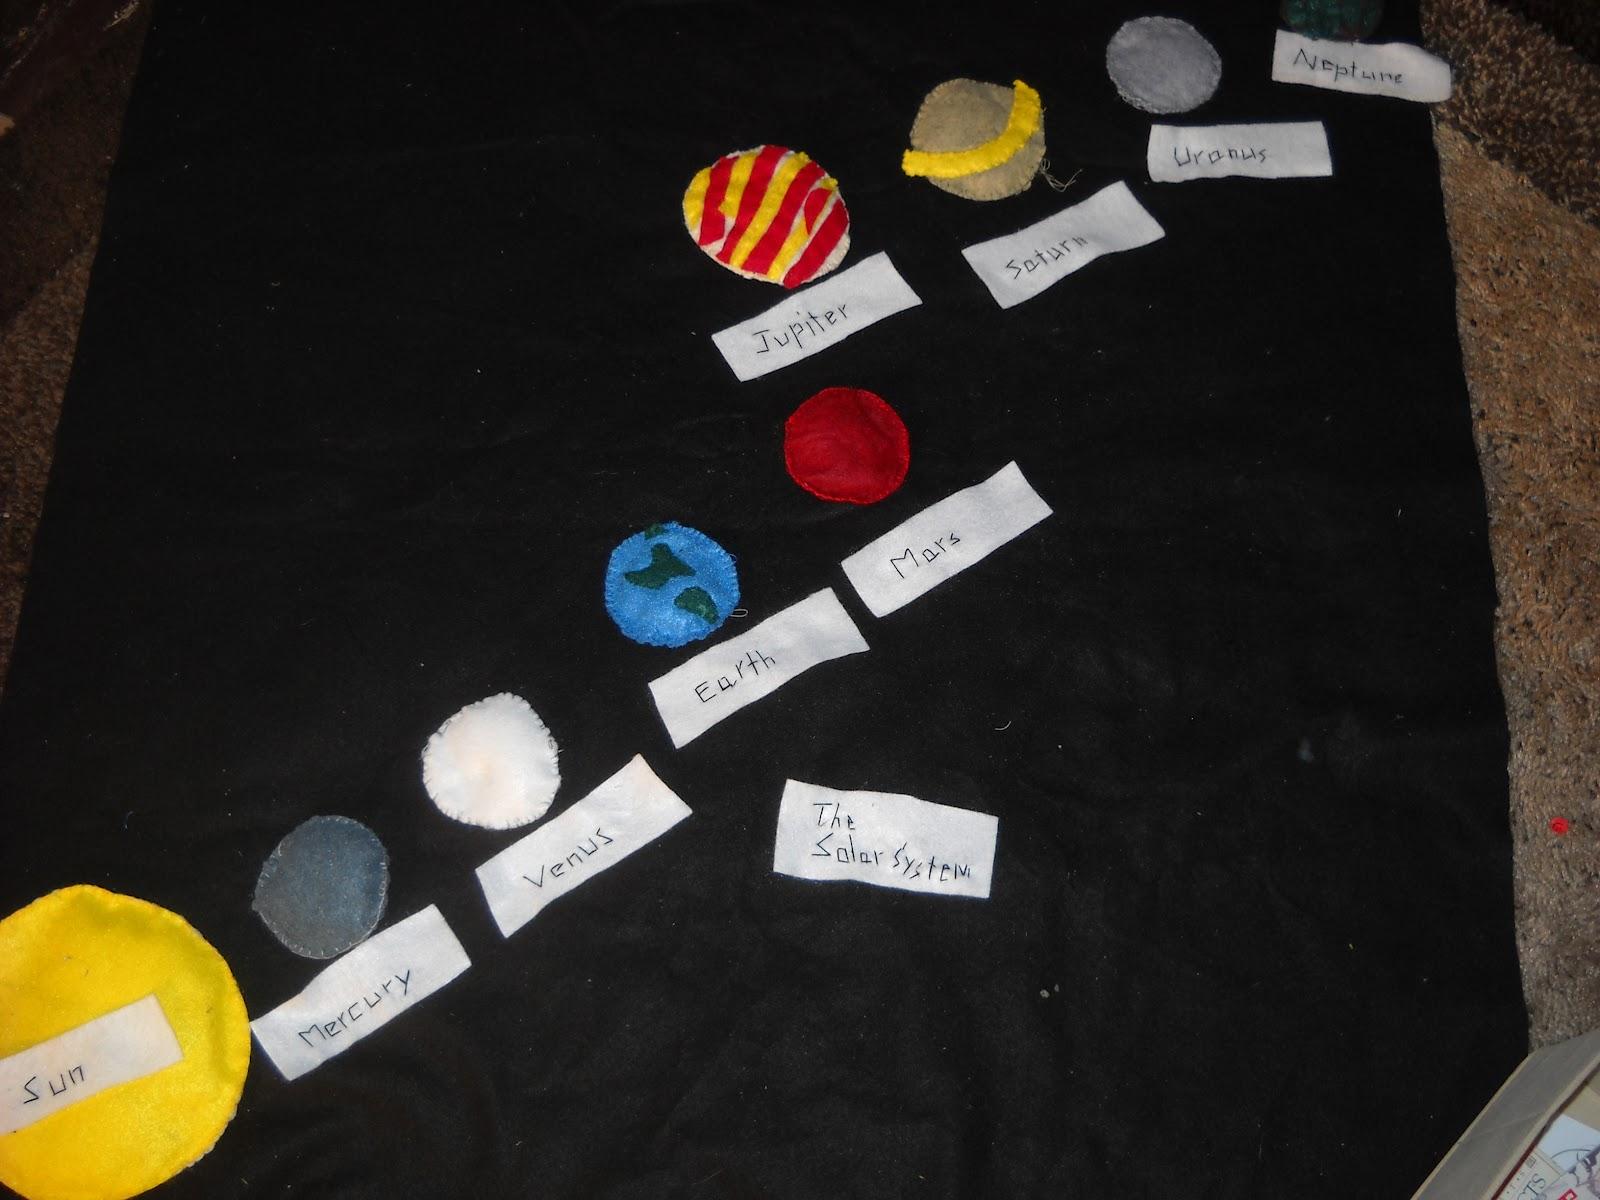 making moments count felt solar system